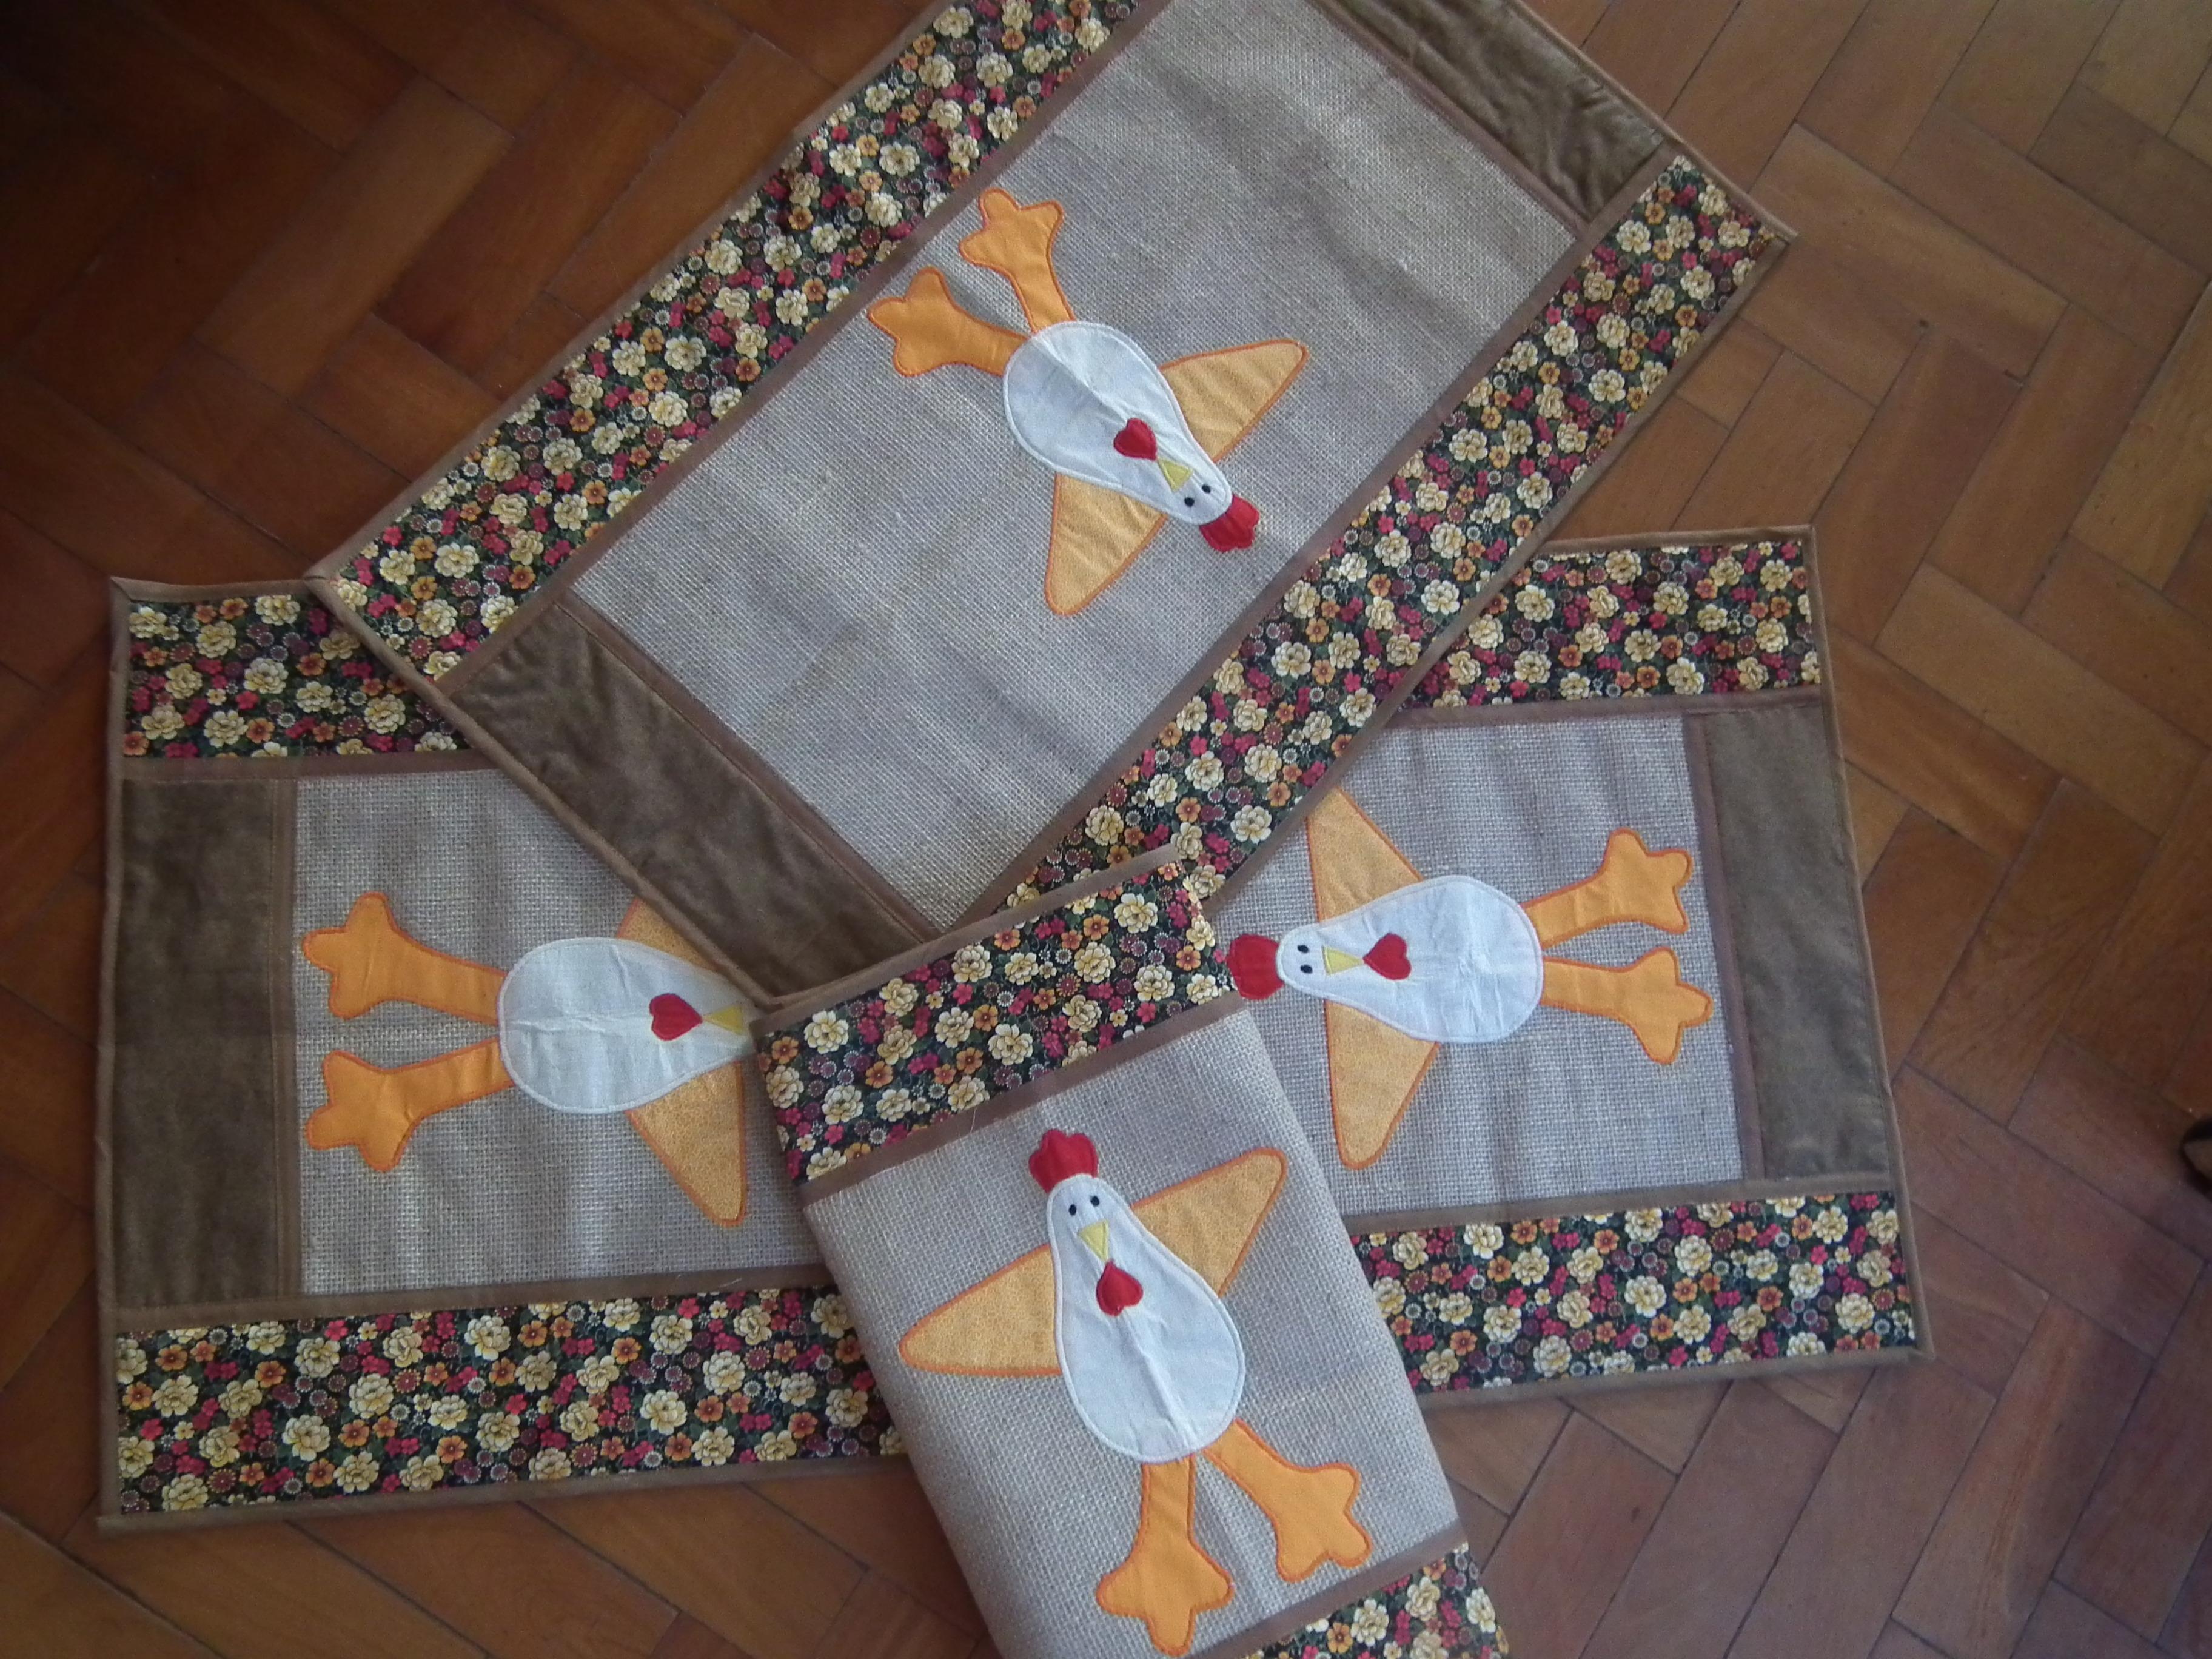 Tapete Patchwork Simples : tapete galinhas da cris tapete galinhas da cris